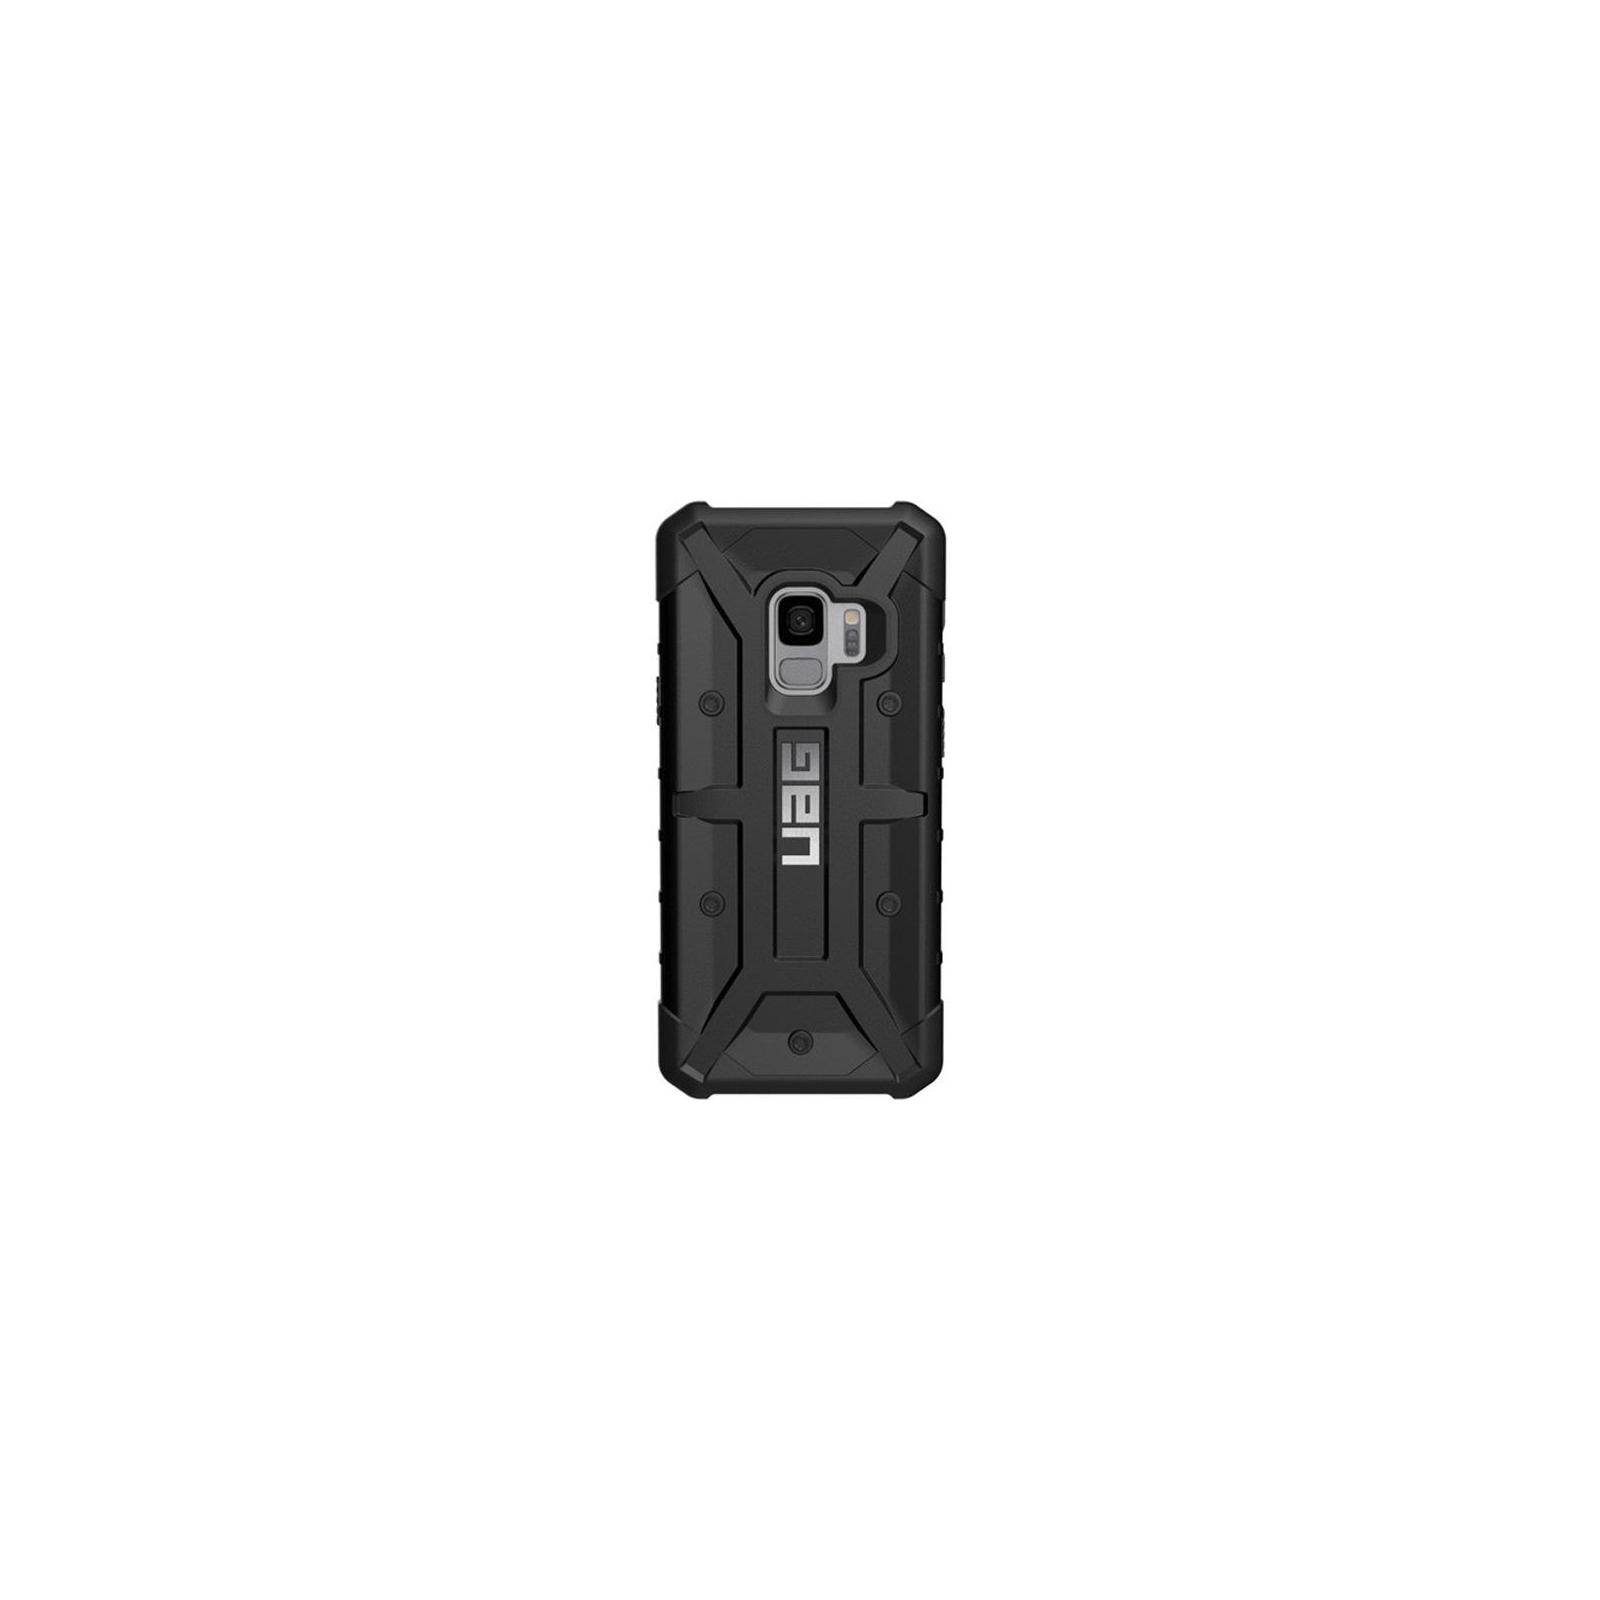 Чехол для моб. телефона Uag Galaxy S9 Pathfinder Black (GLXS9-A-BK)